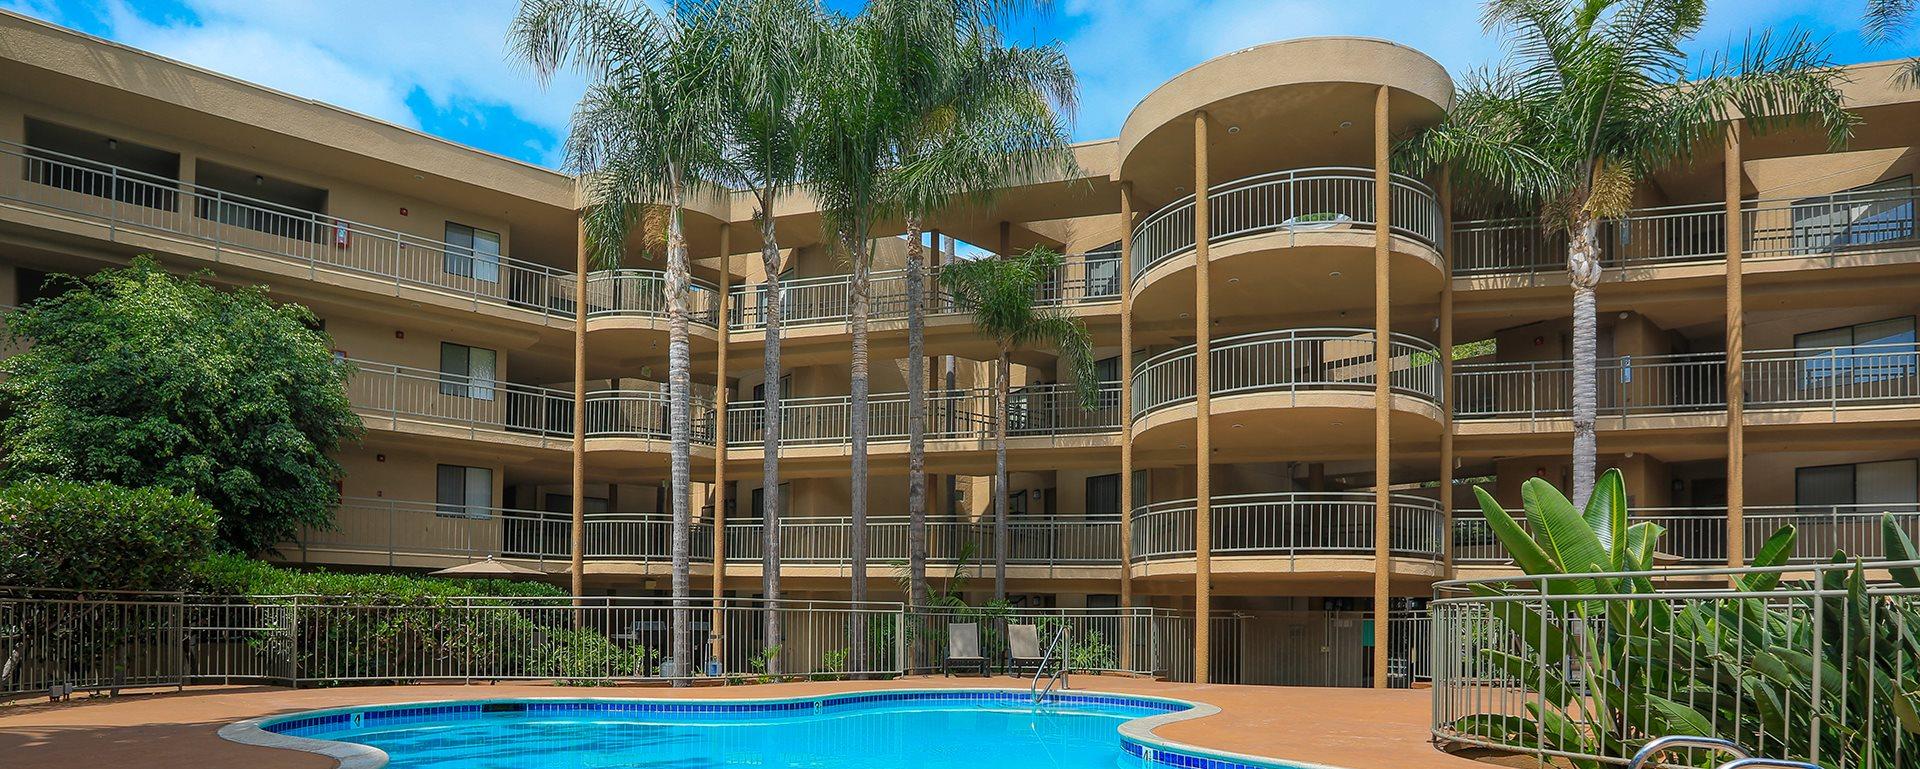 Bixby knolls apartments in long beach ca - One bedroom apartments in bixby knolls ...